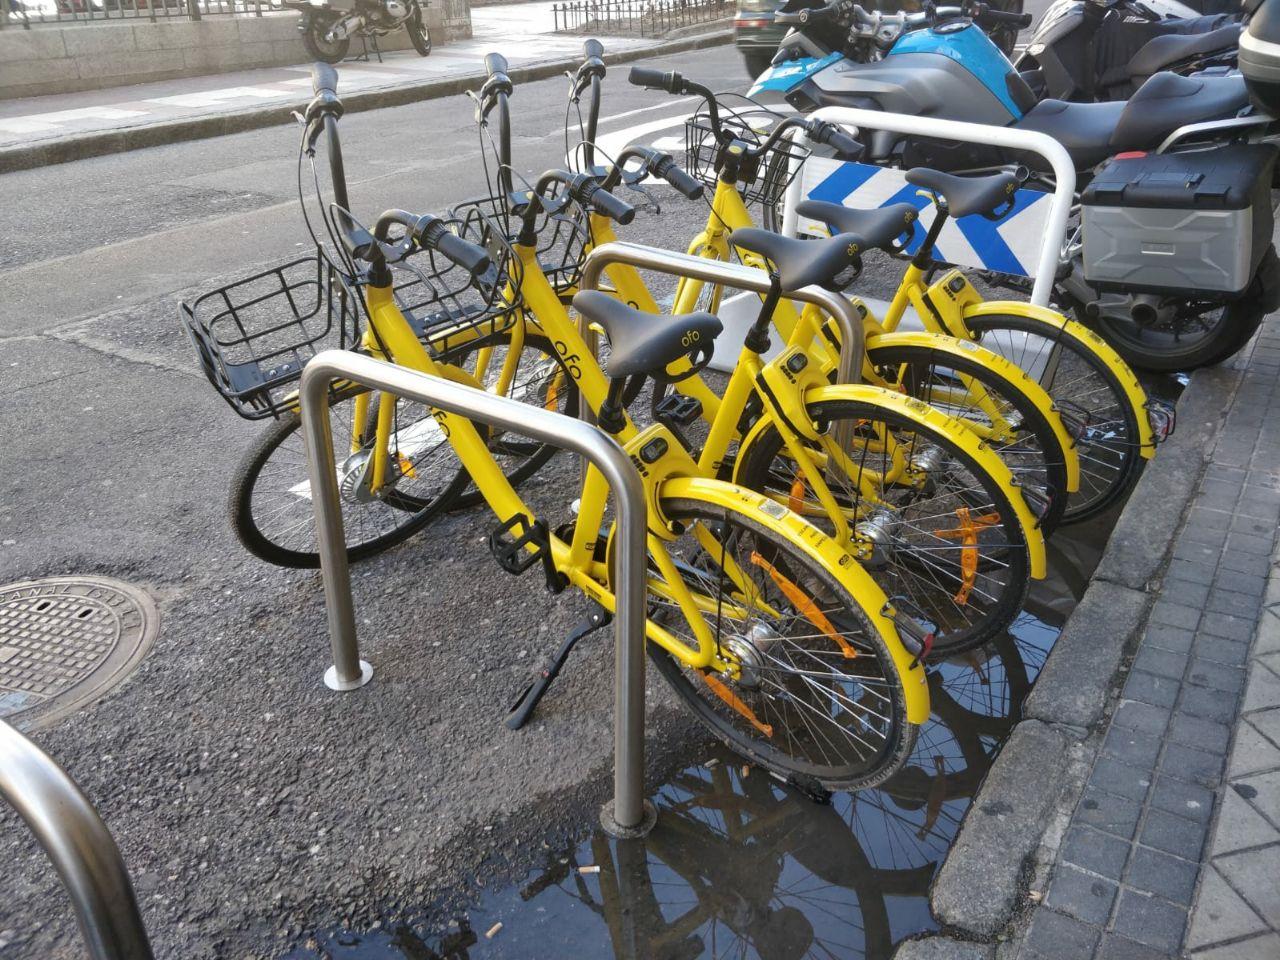 Varias bicicletas de Ofo Bike en un aparcabicis.